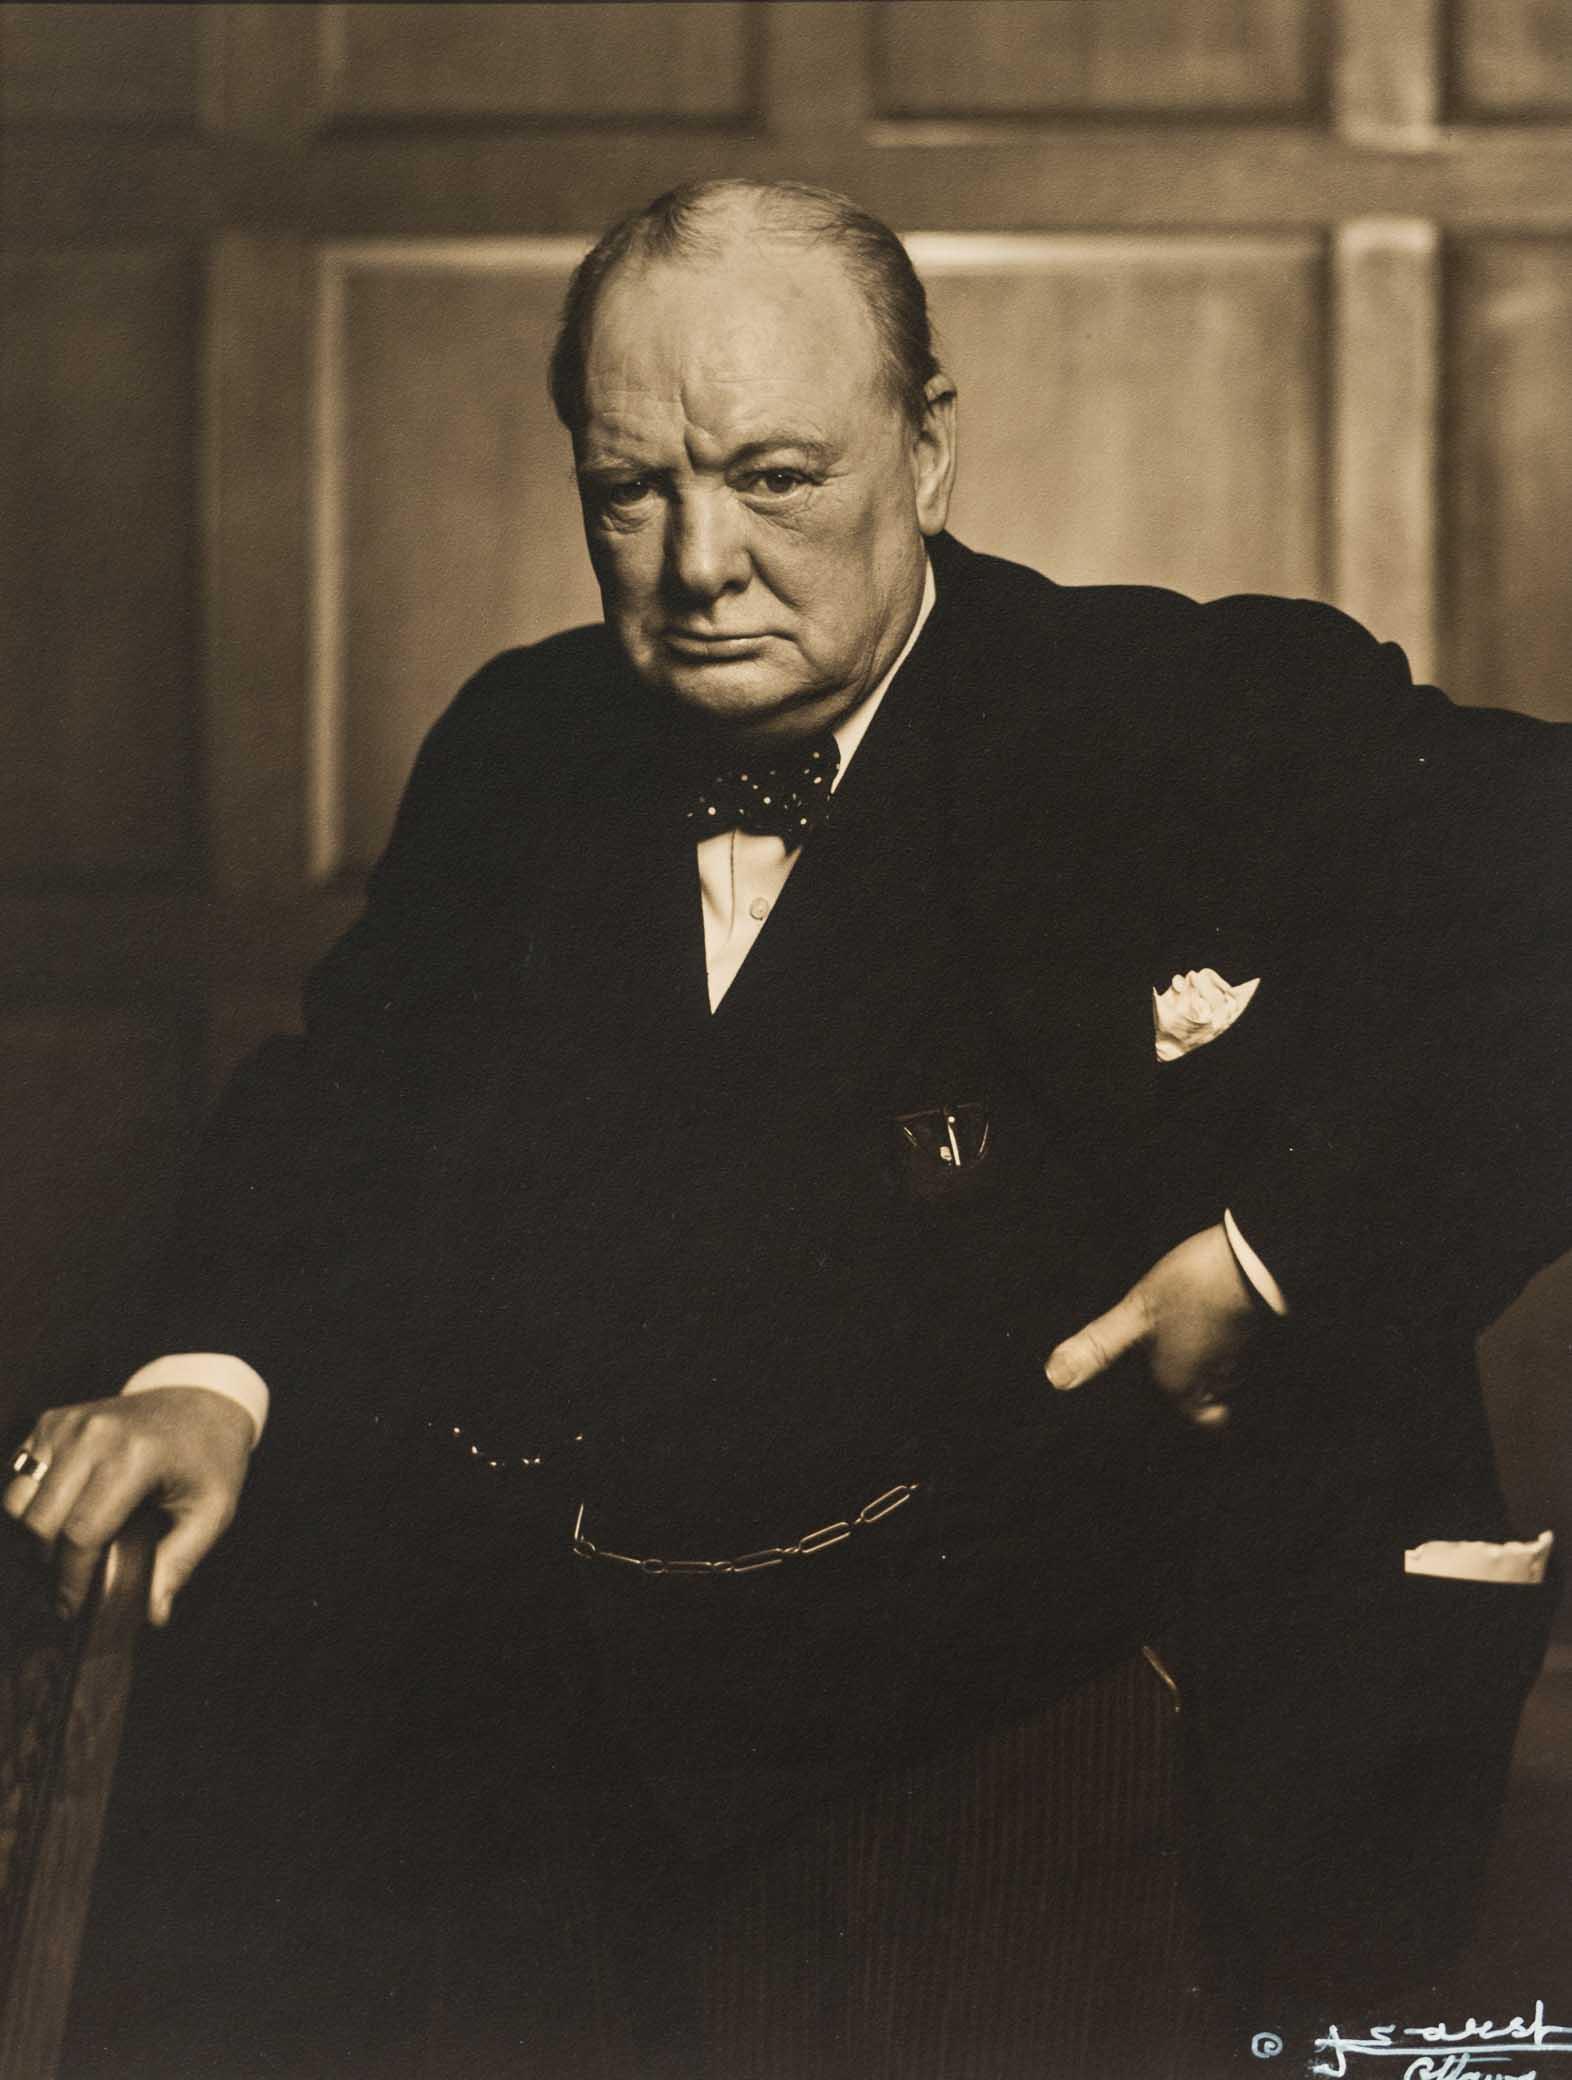 Yousuf Karsh,  Winston Churchill , 1941, silver gelatin print, Gift of the Estate of David P. Hauseman